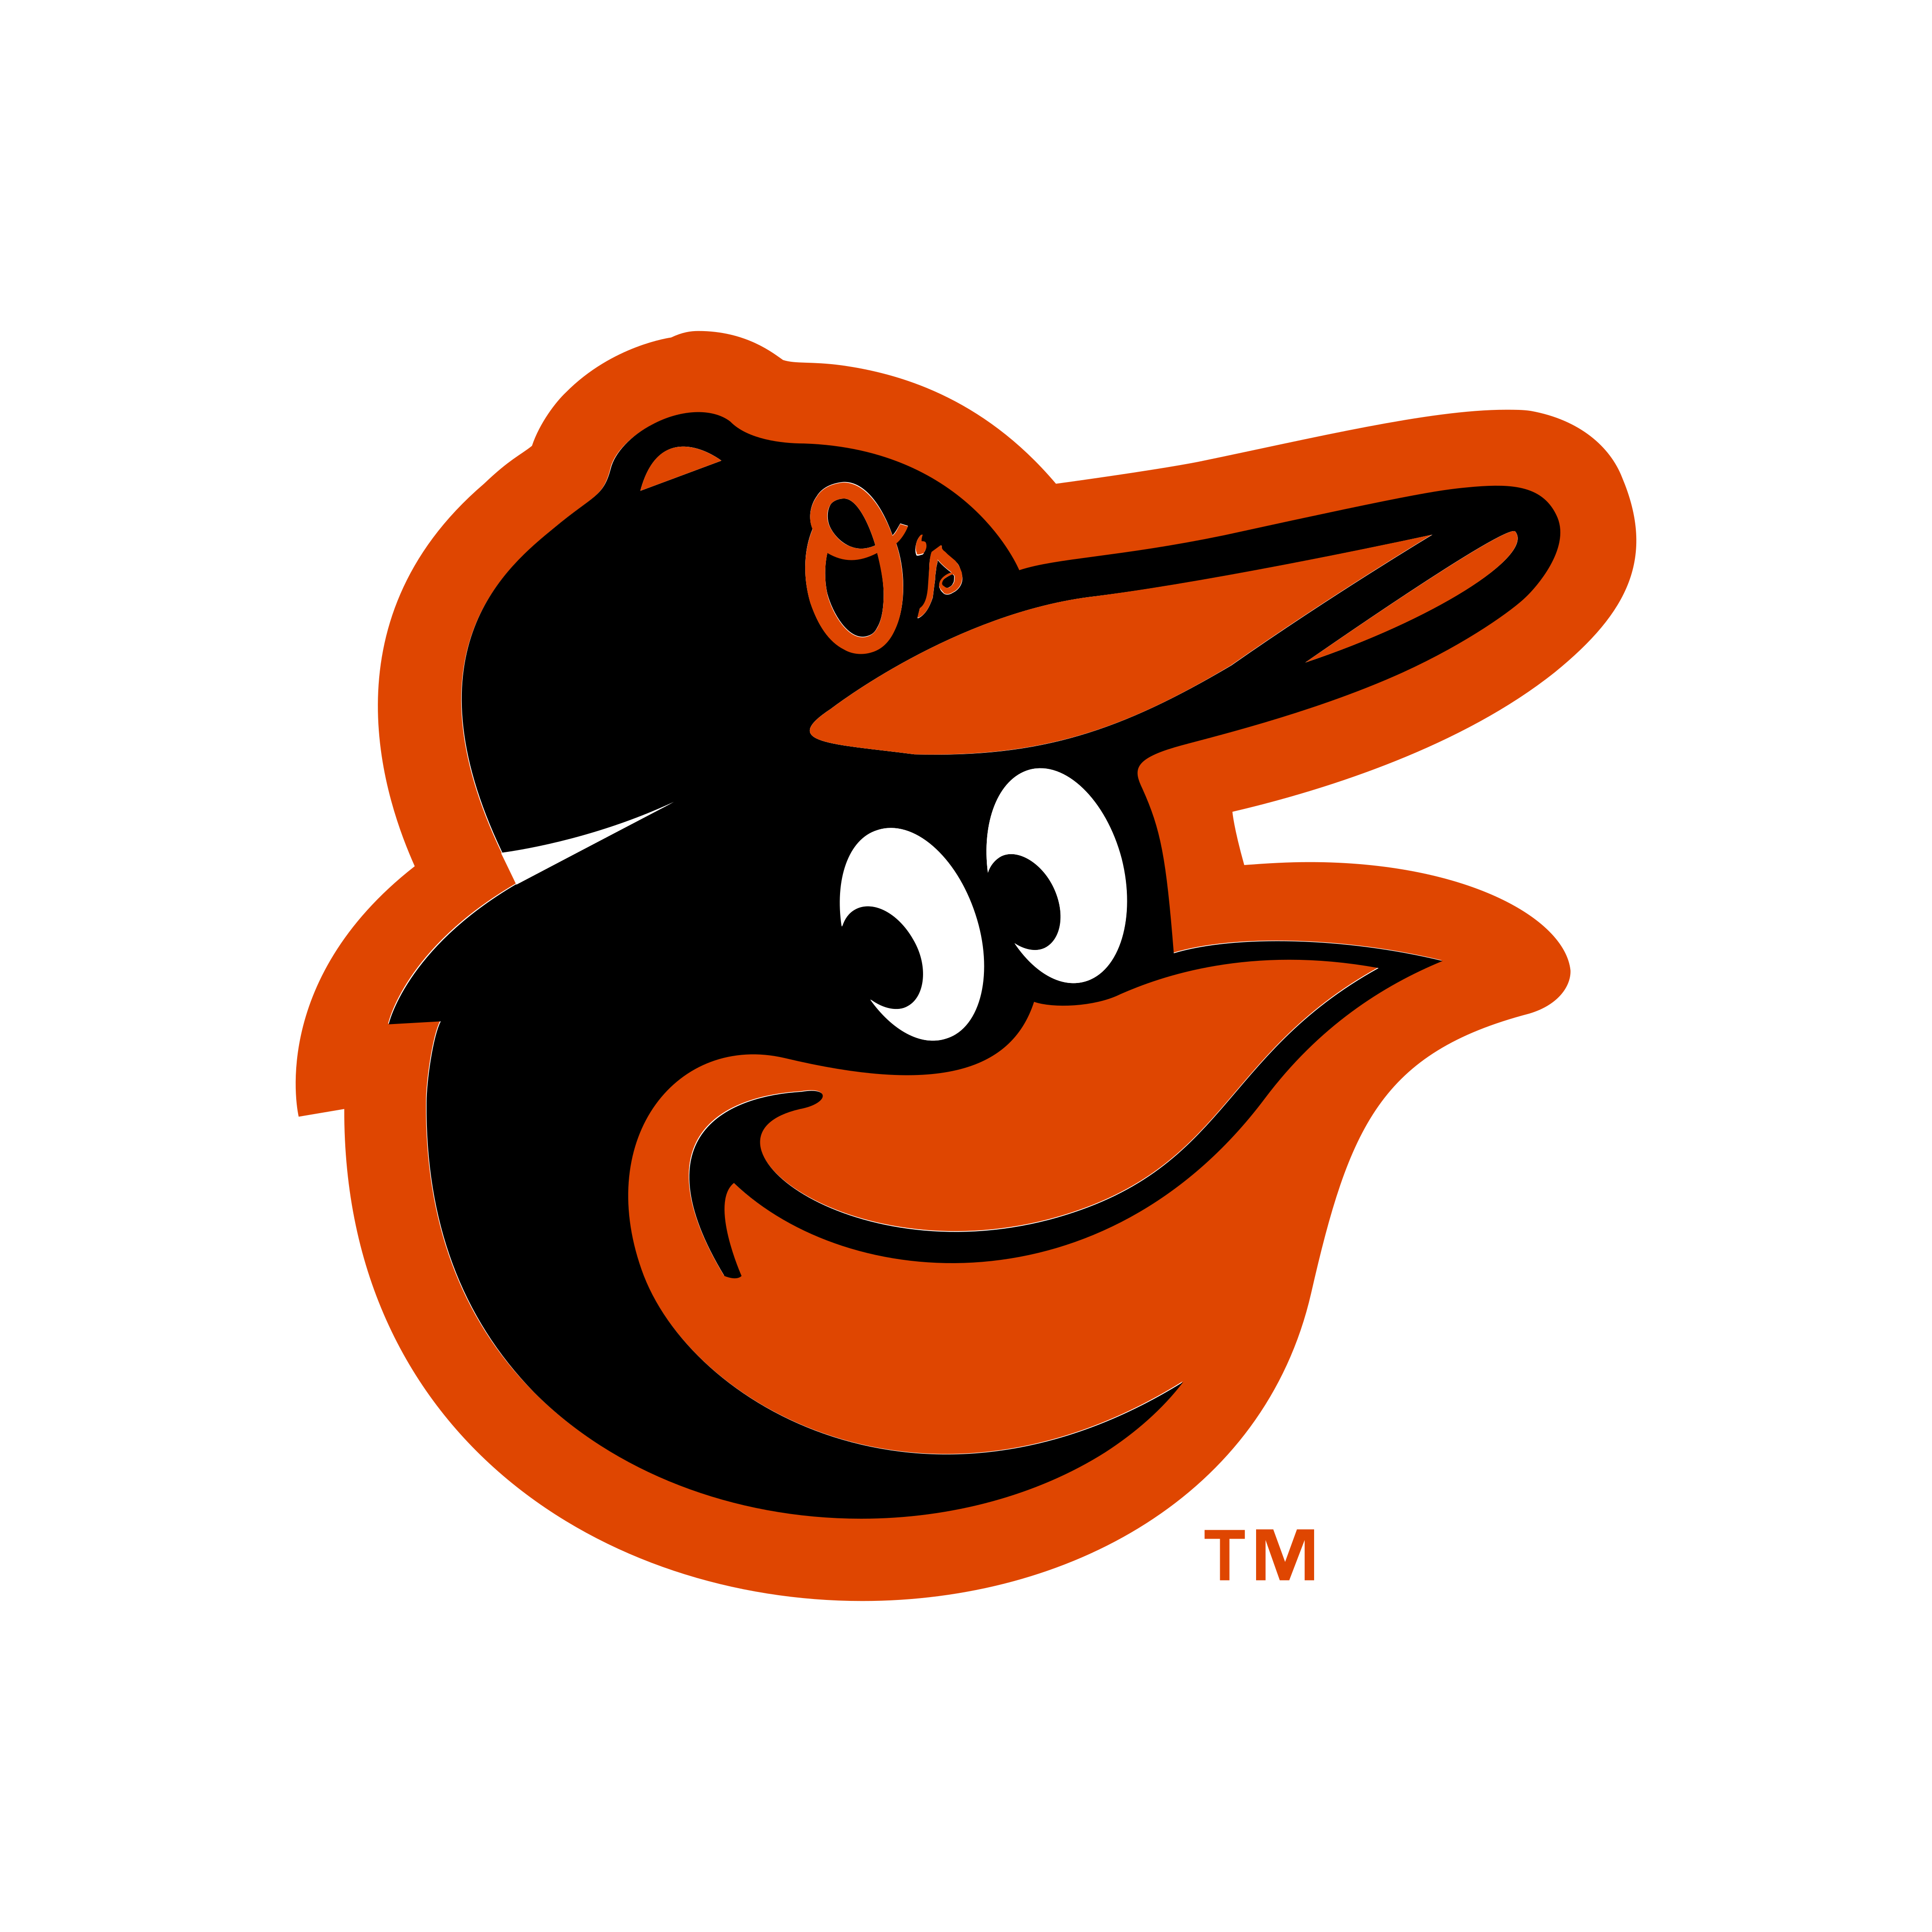 baltimore orioles logo 0 - Baltimore Orioles Logo